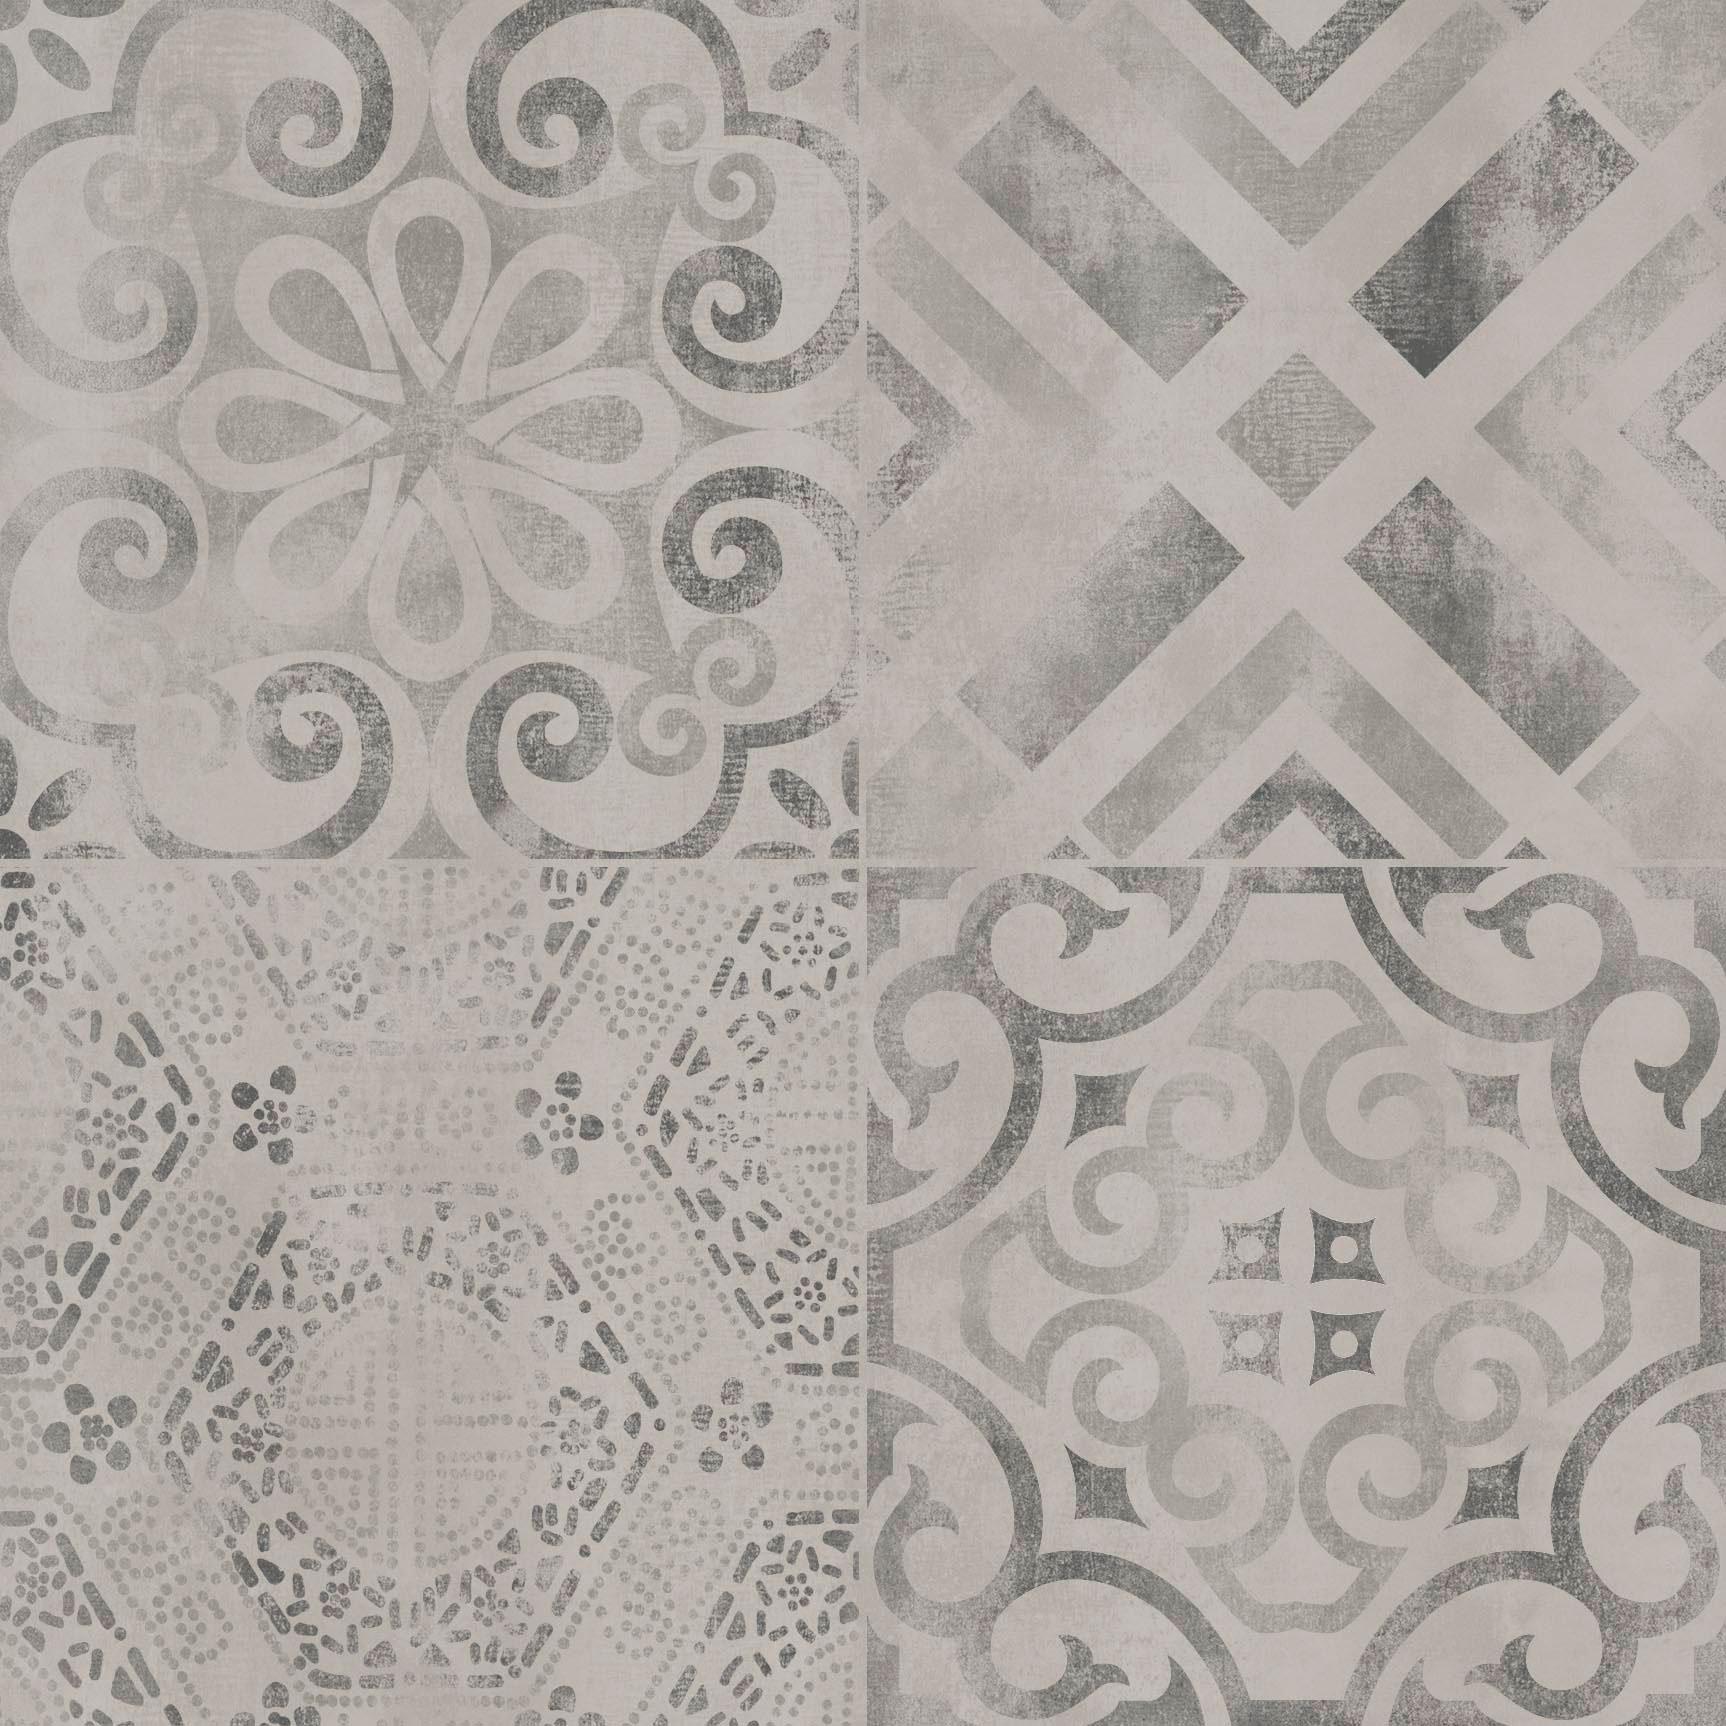 Напольная плитка Ceramika Konskie Raphael Grey 45x45 (1,62) напольная плитка dual gres chic seaford grey 45x45